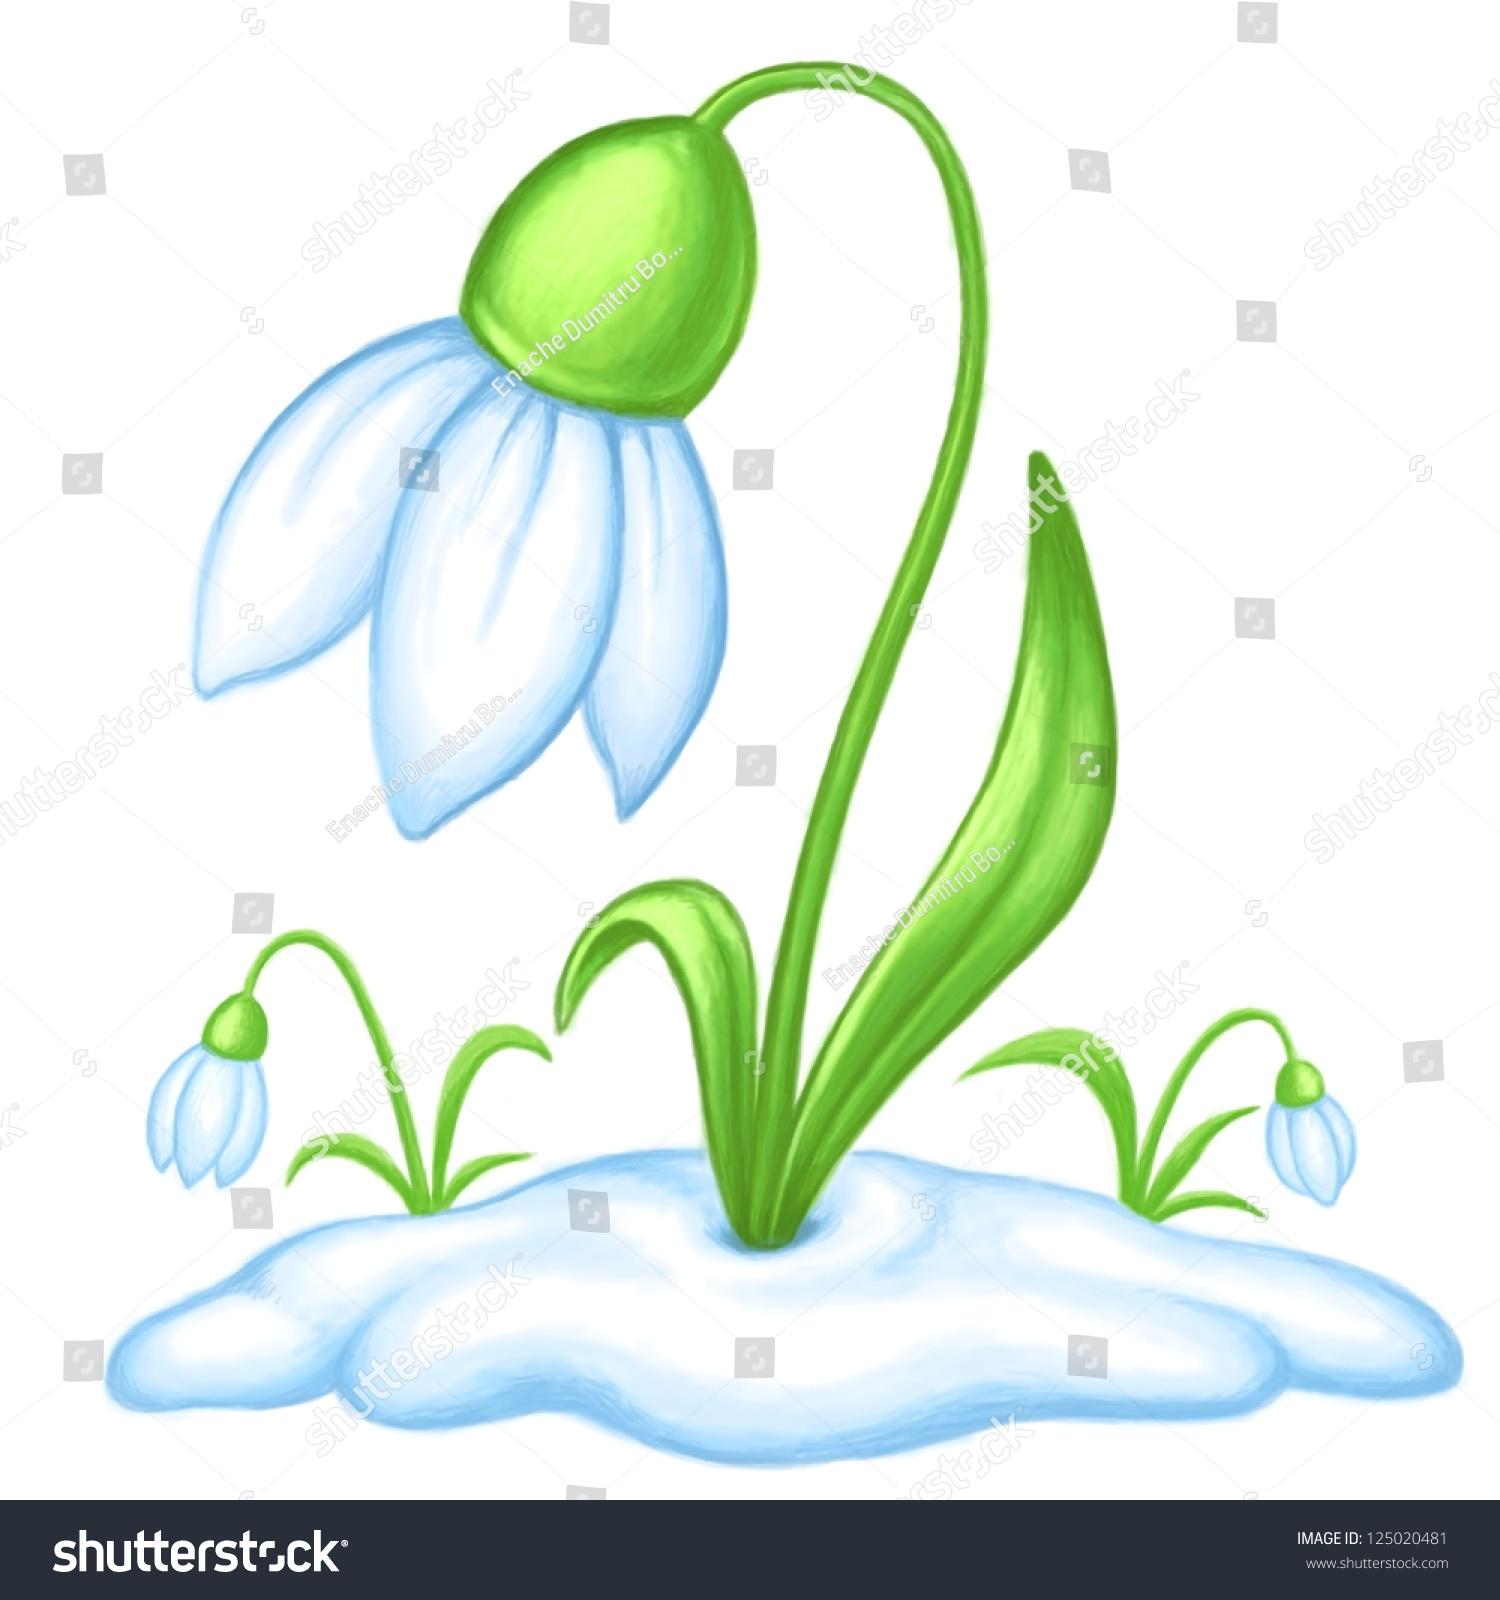 Cartoon snowdrop flowers spring symbols stock illustration cartoon snowdrop flowers spring symbols biocorpaavc